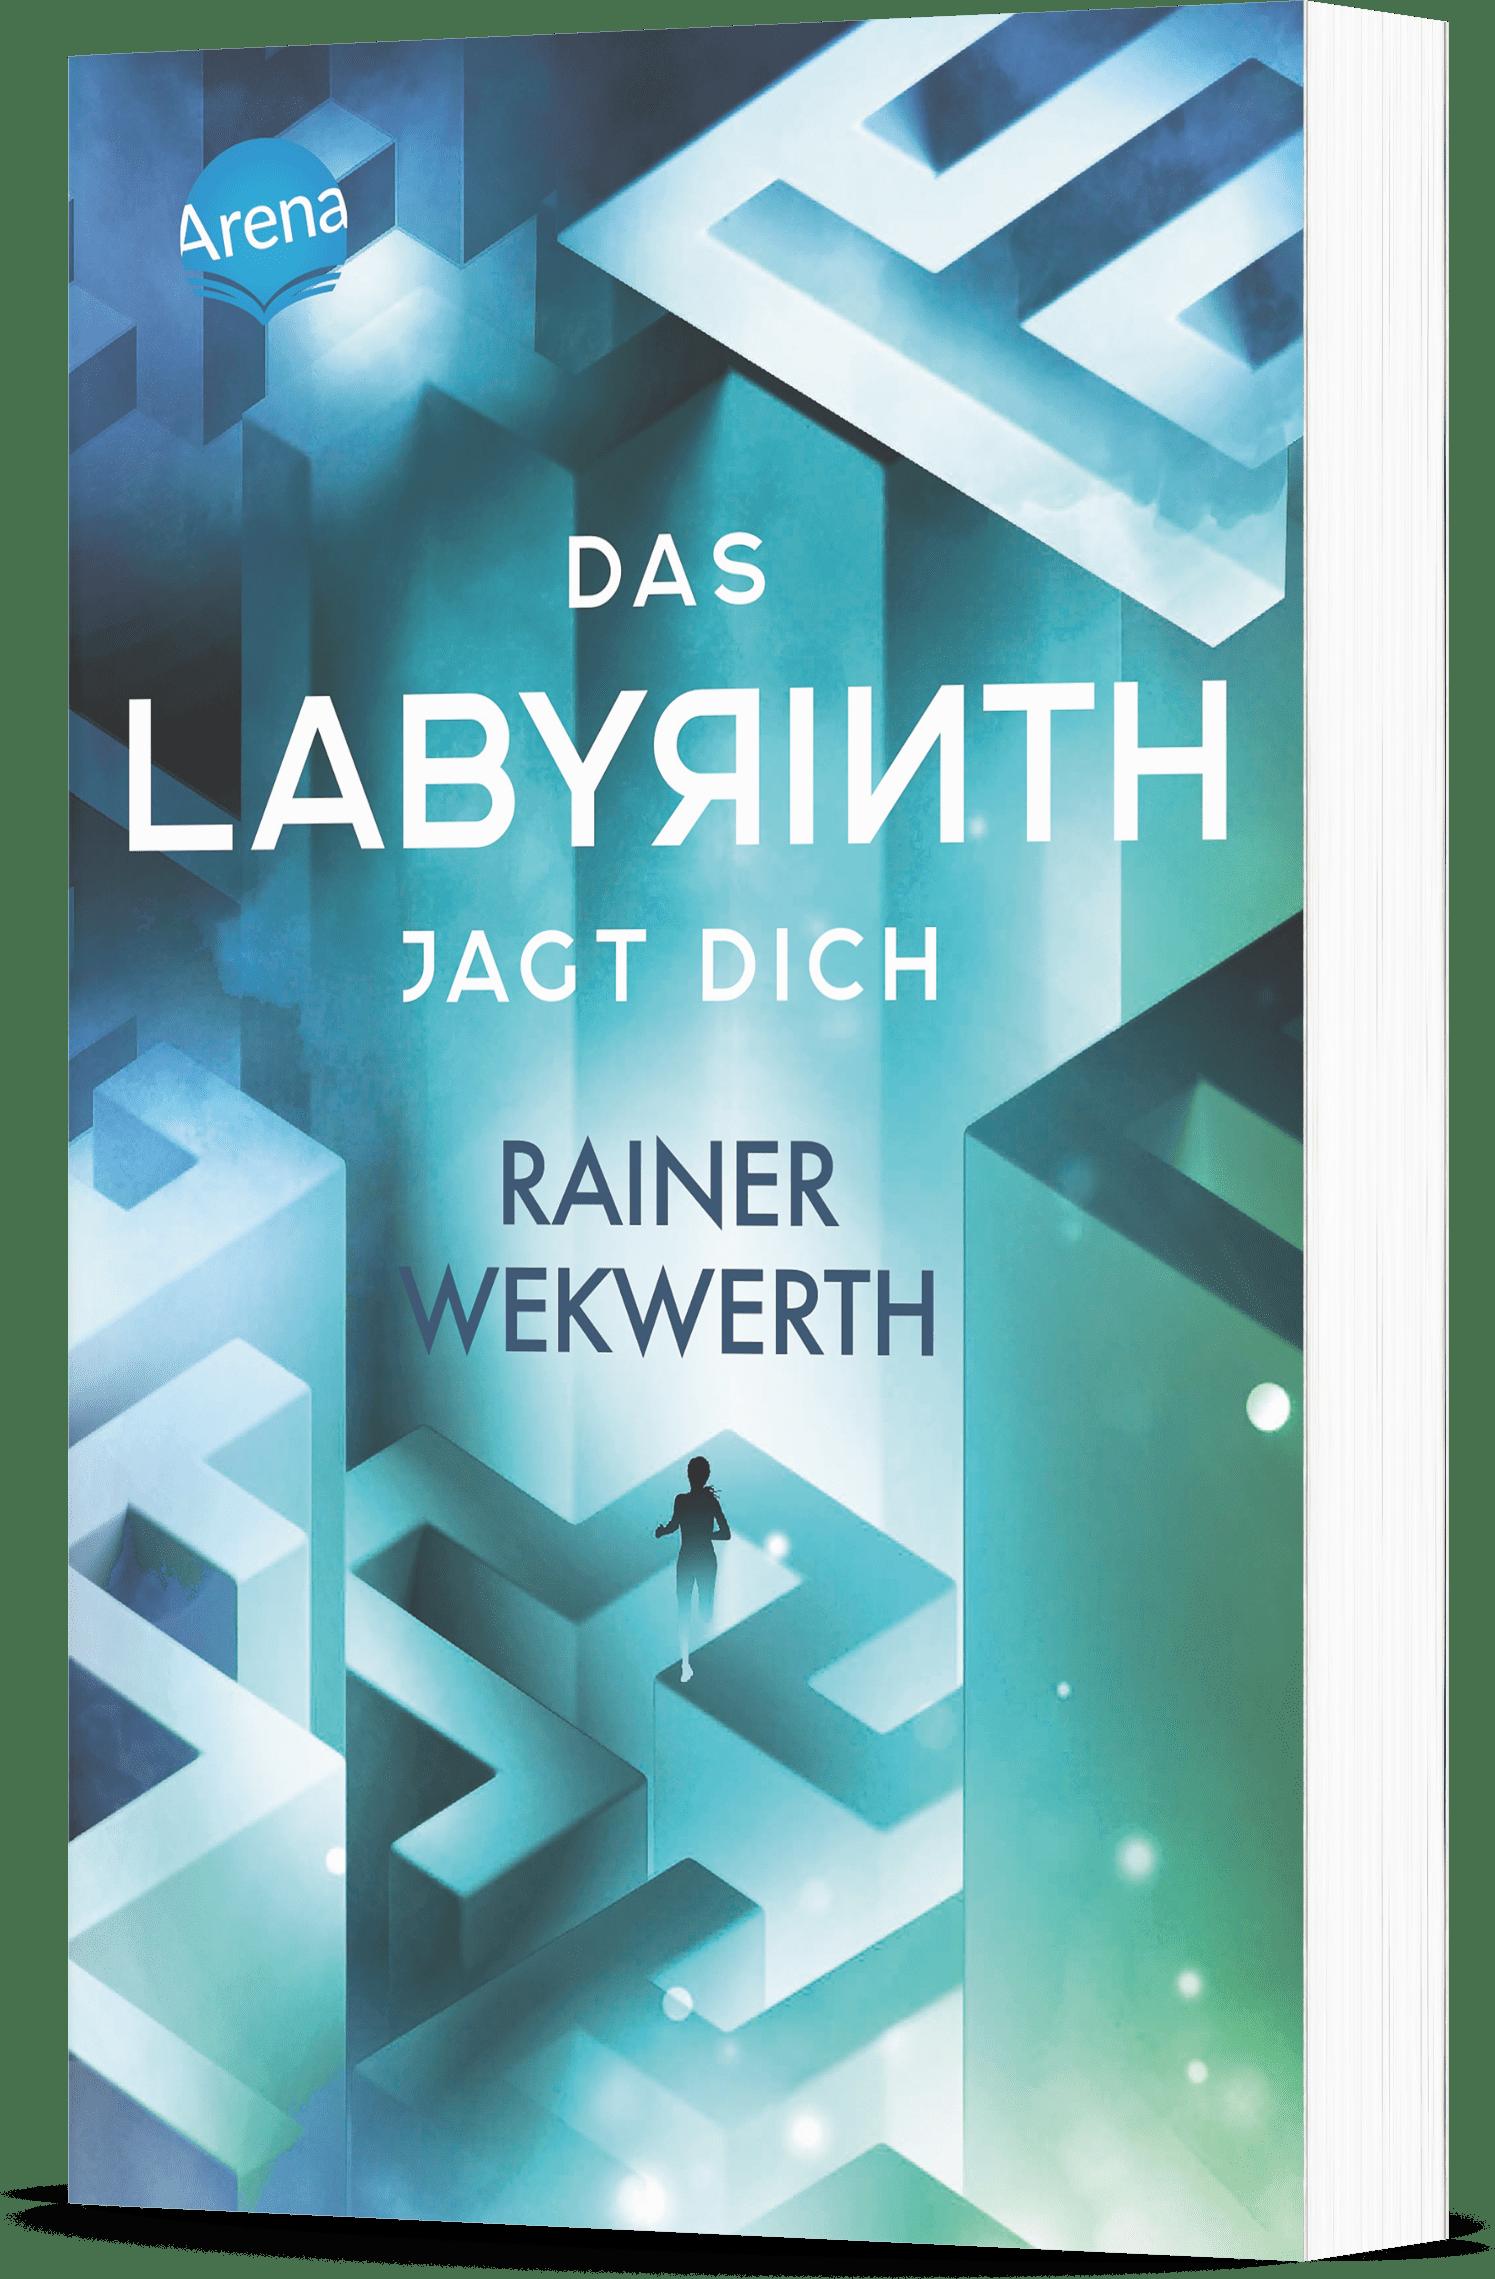 mockup-labyrinth-2